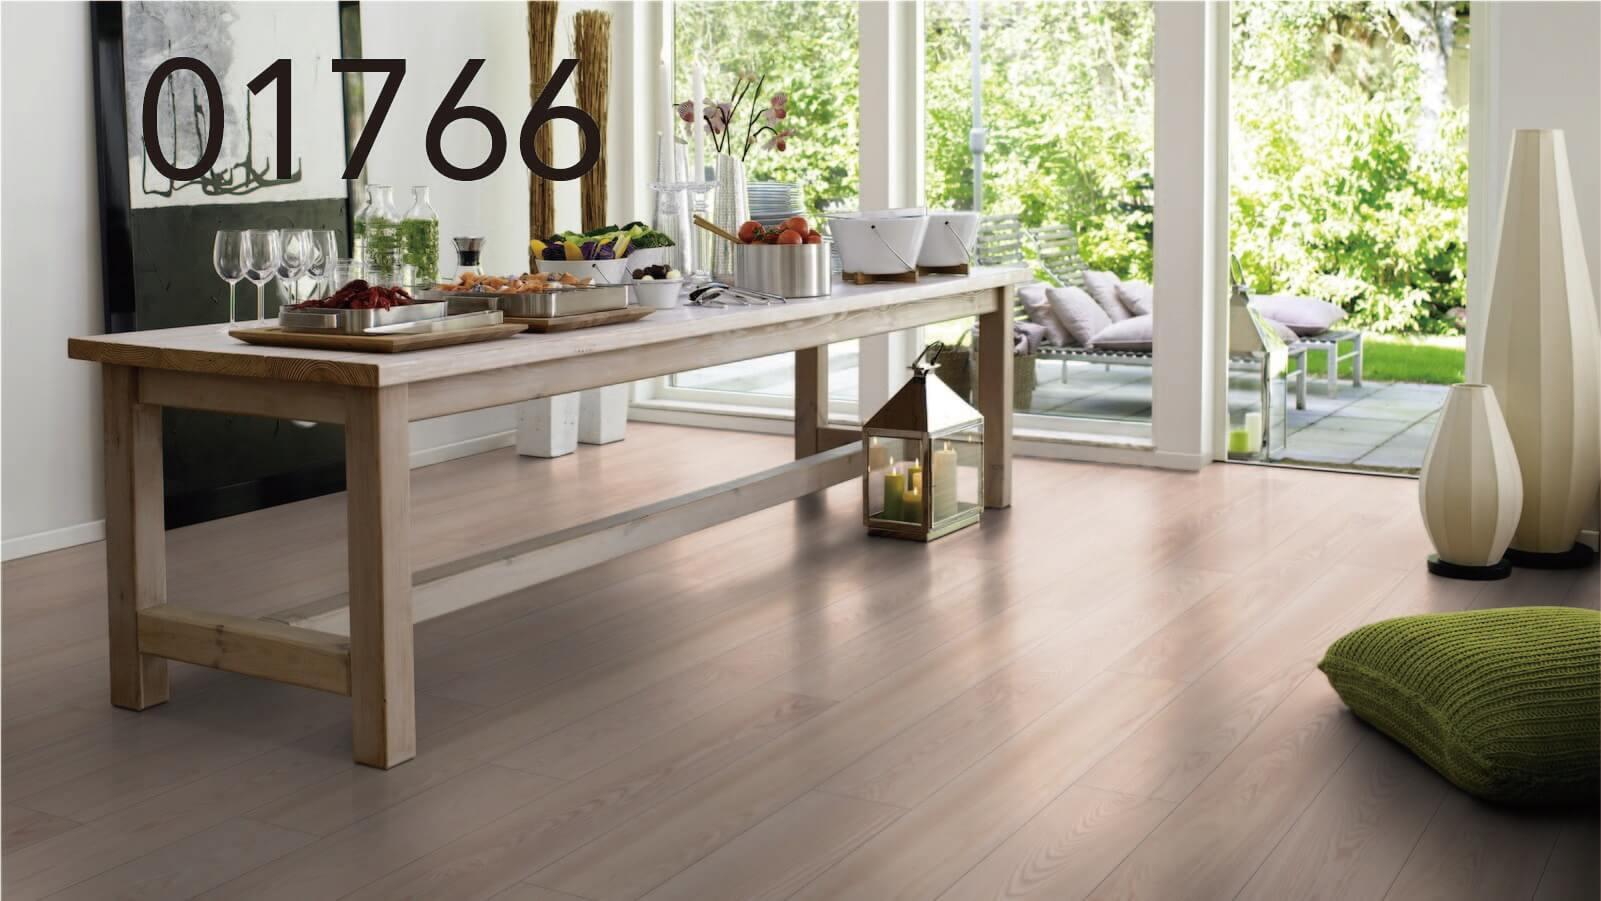 L0323-01766原始梣木